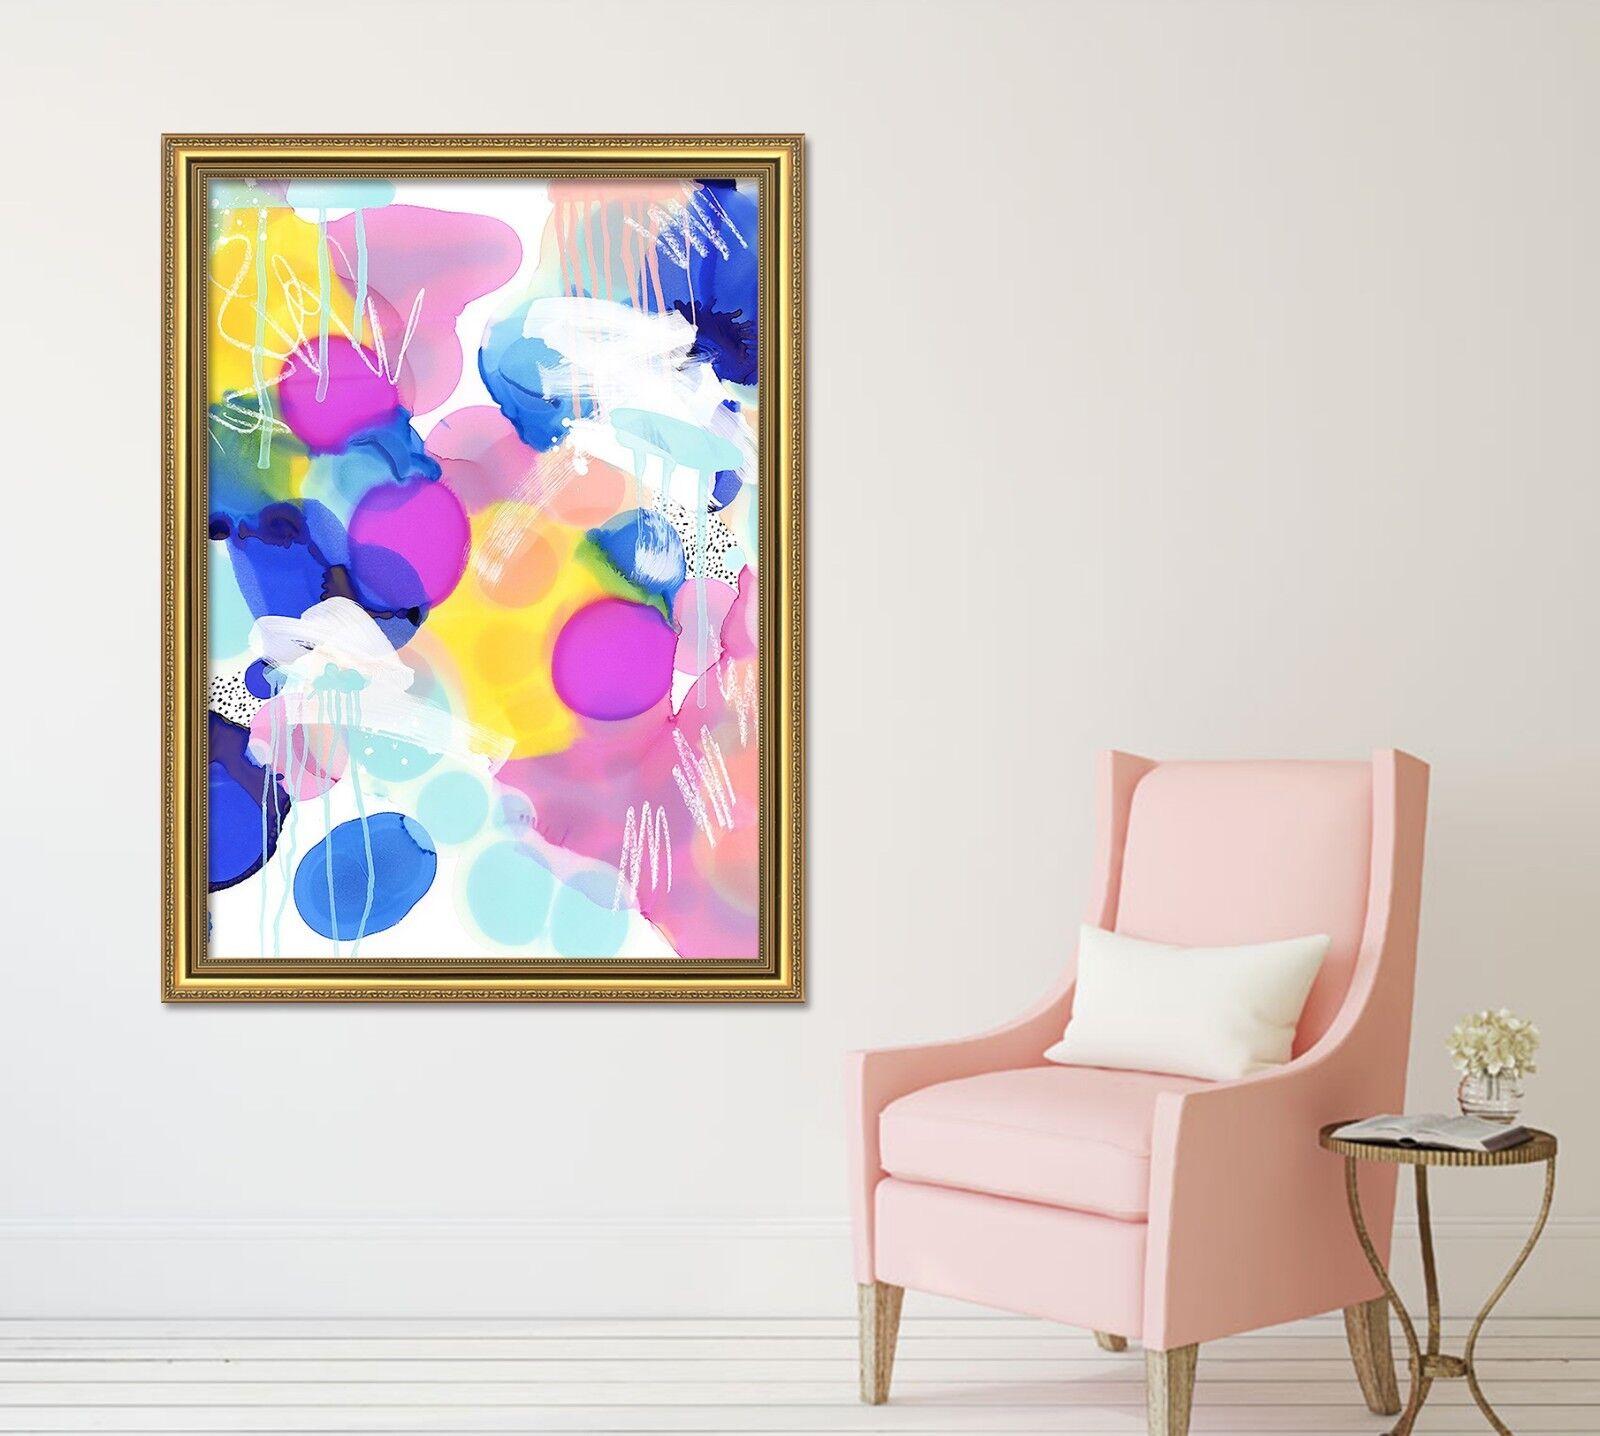 3D Fashion Modern 2 Framed Poster Home Decor Print Painting Art AJ WALLPAPER